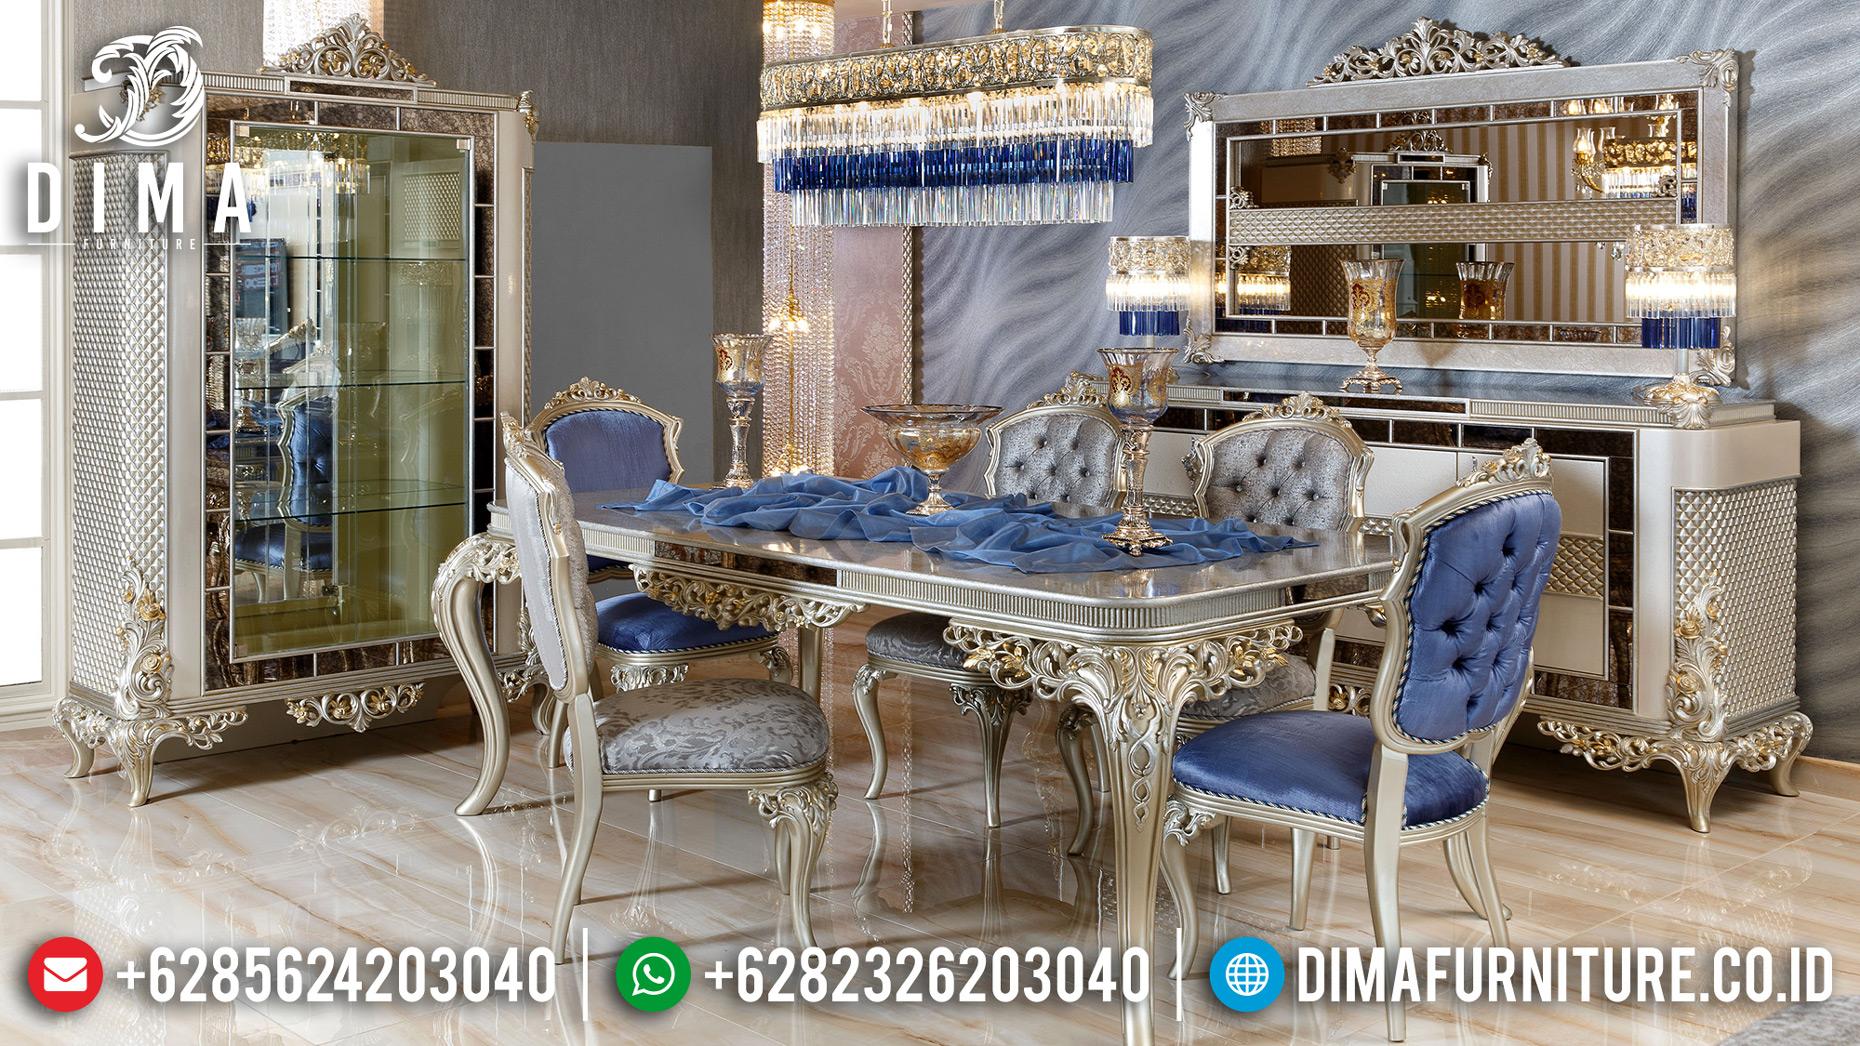 Jual Meja Makan Mewah Ukiran Klasik Type Luxury Silver Champagne MMJ-0632